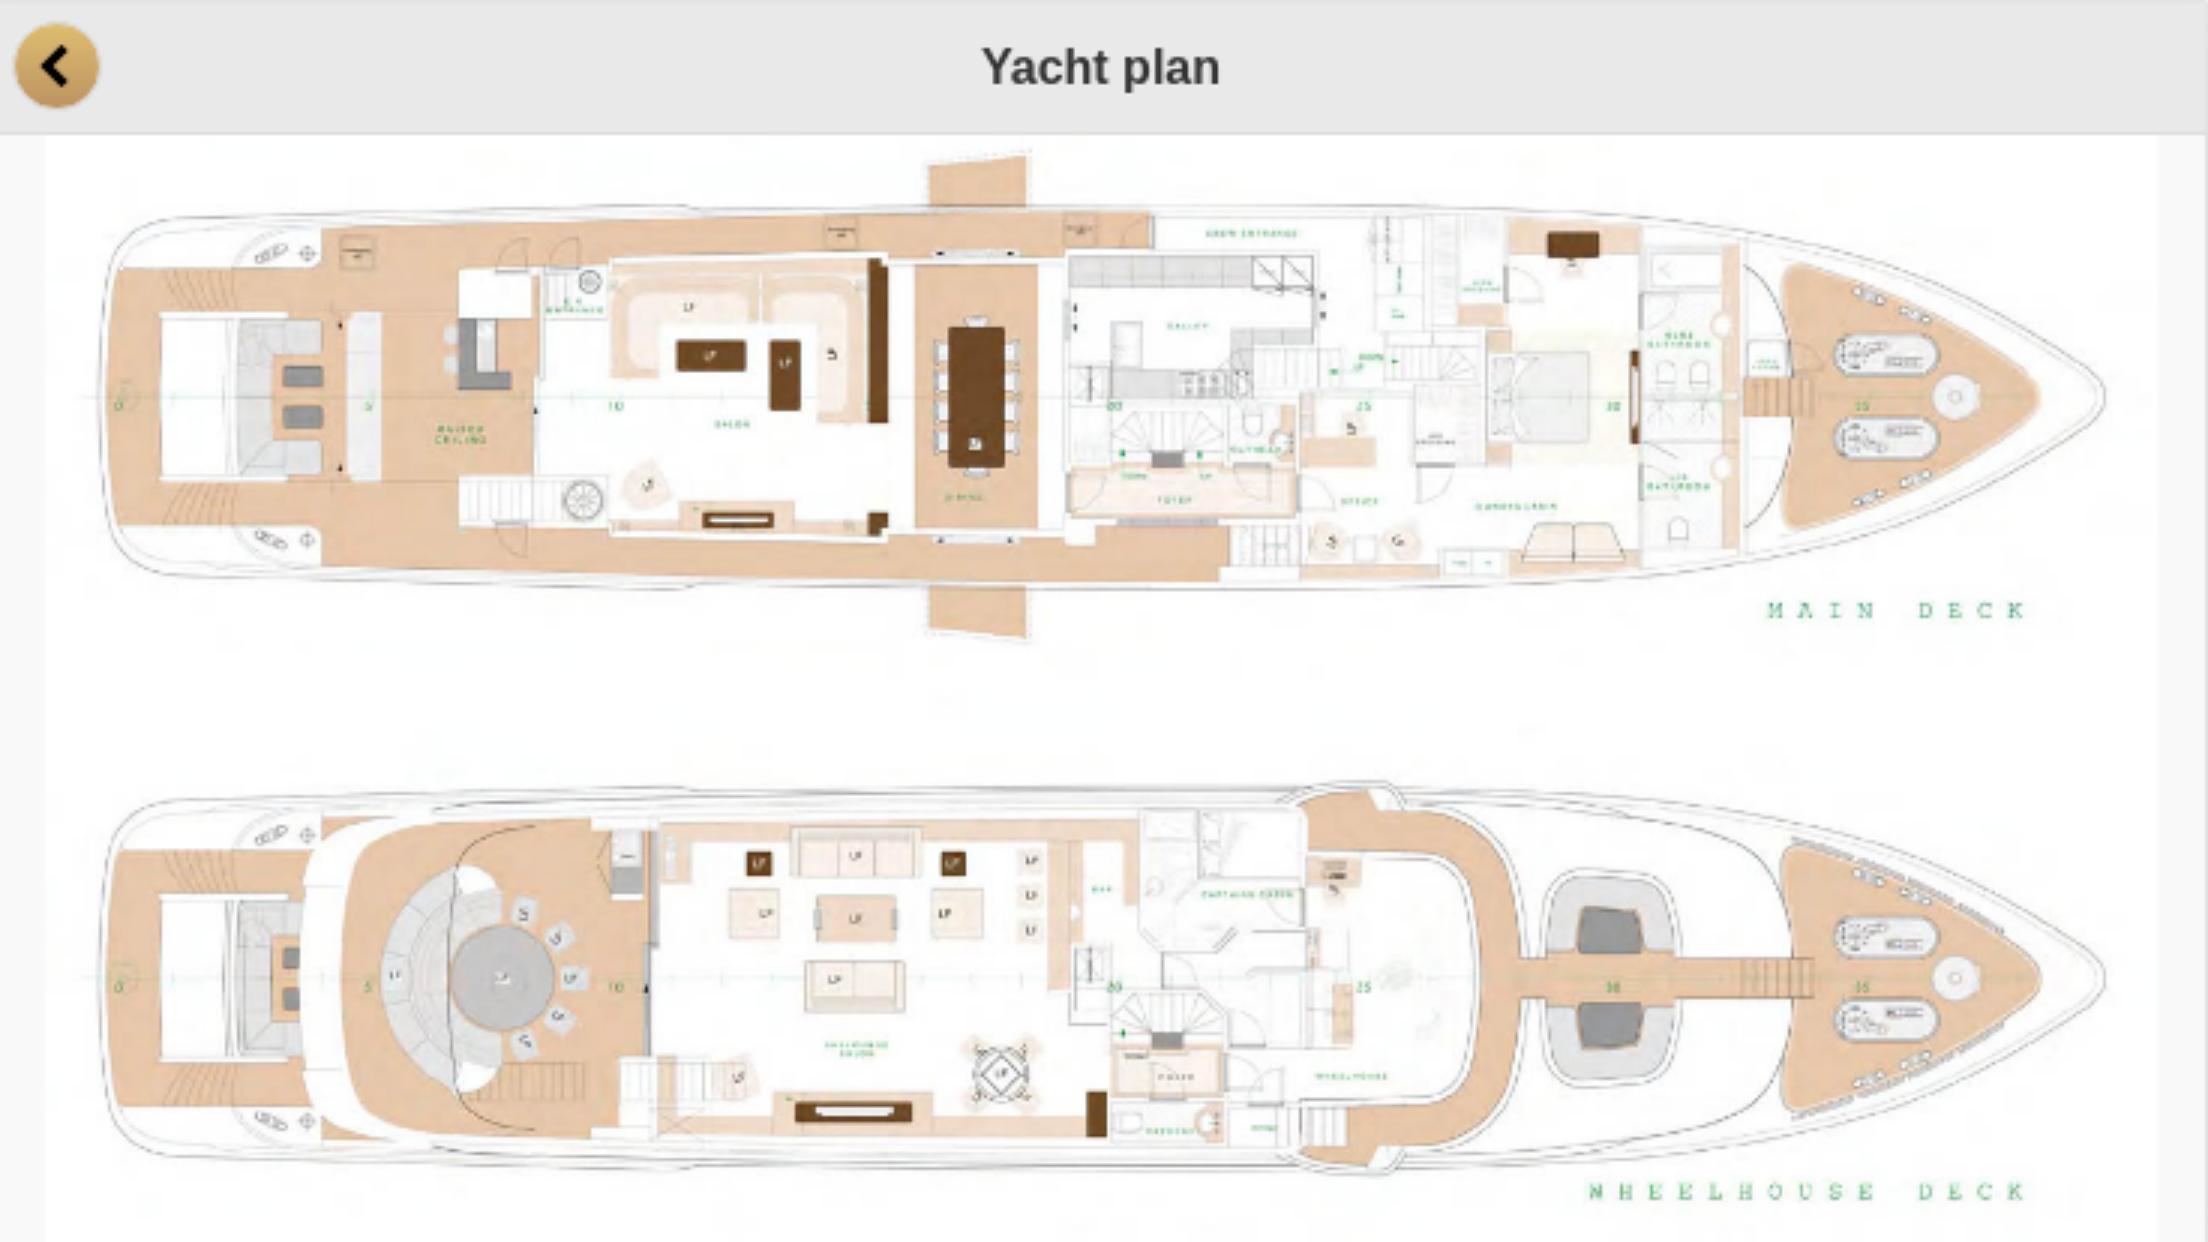 jongert план яхты Лаборатория IOS